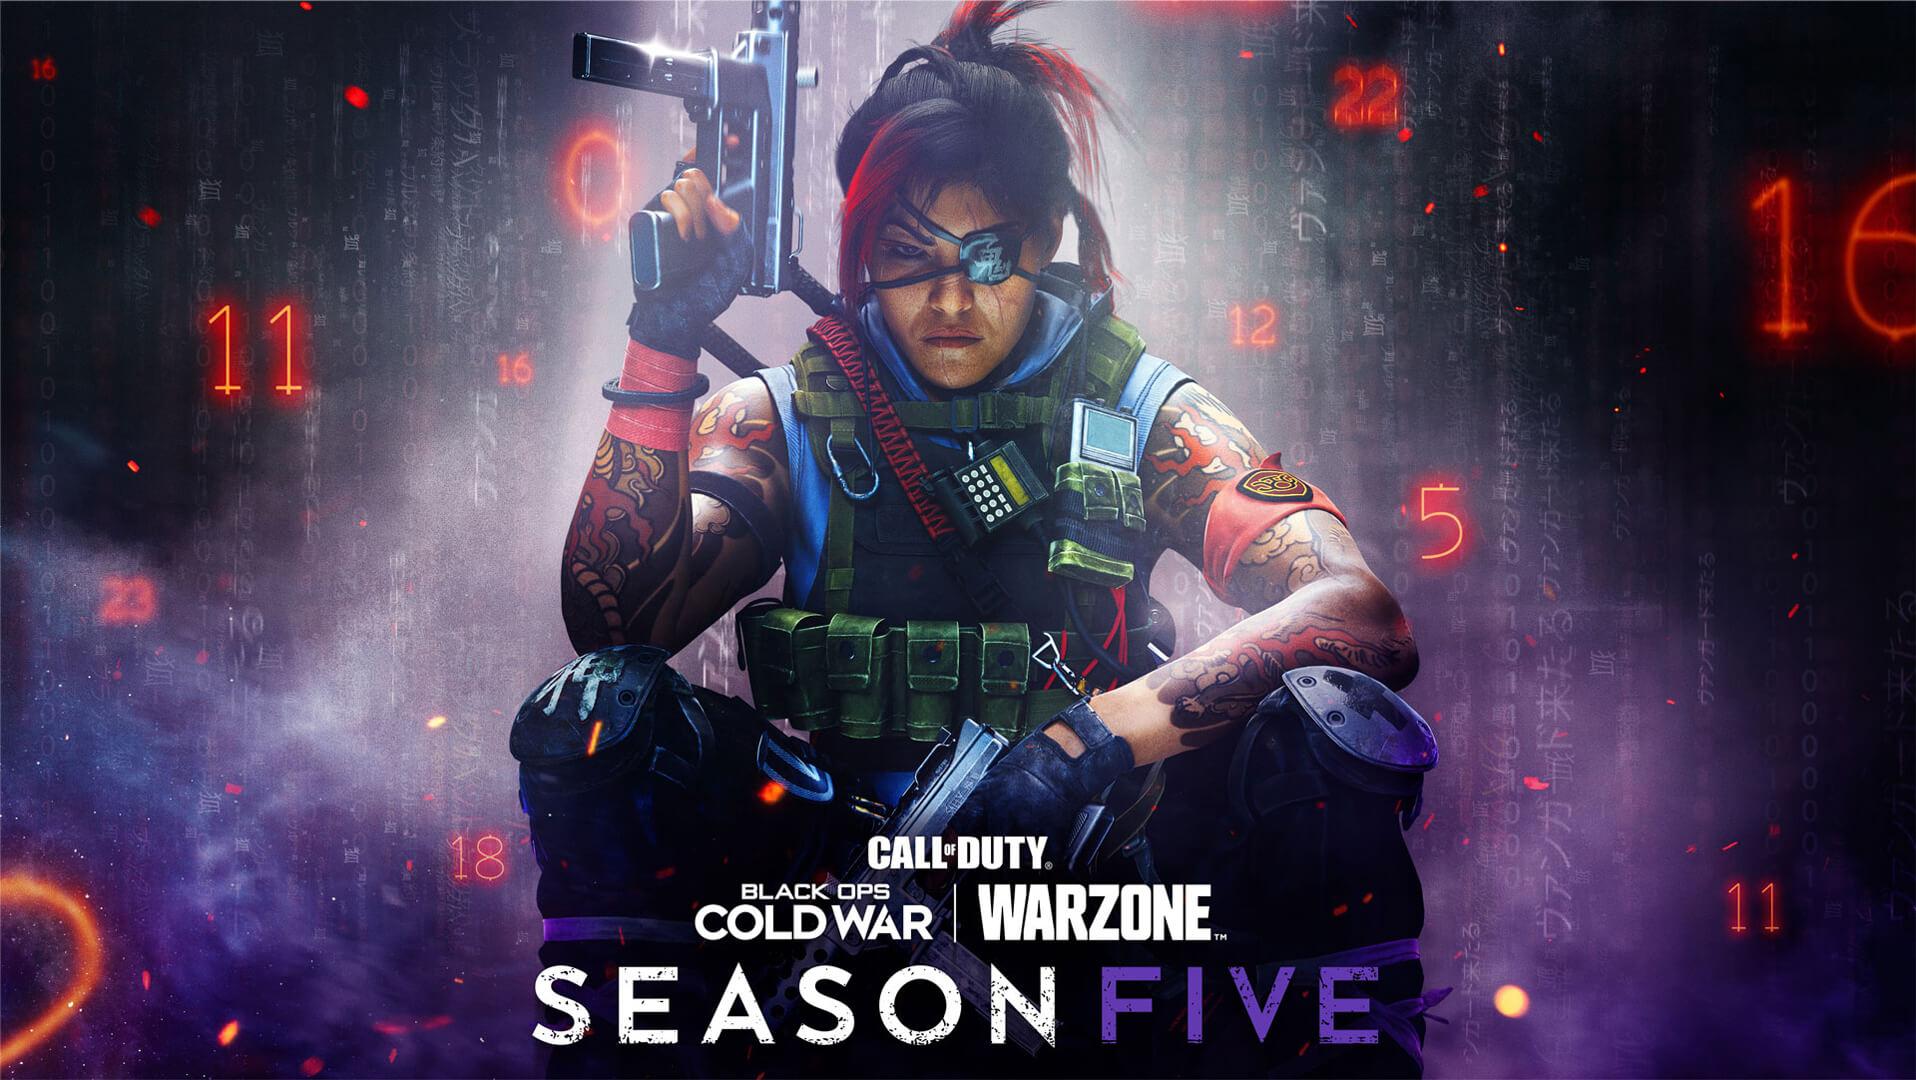 COD_Season5 - Start der Season 5 | Call of Duty: Black Ops – COLD WAR und WARZONE - JOMIWE GAMING